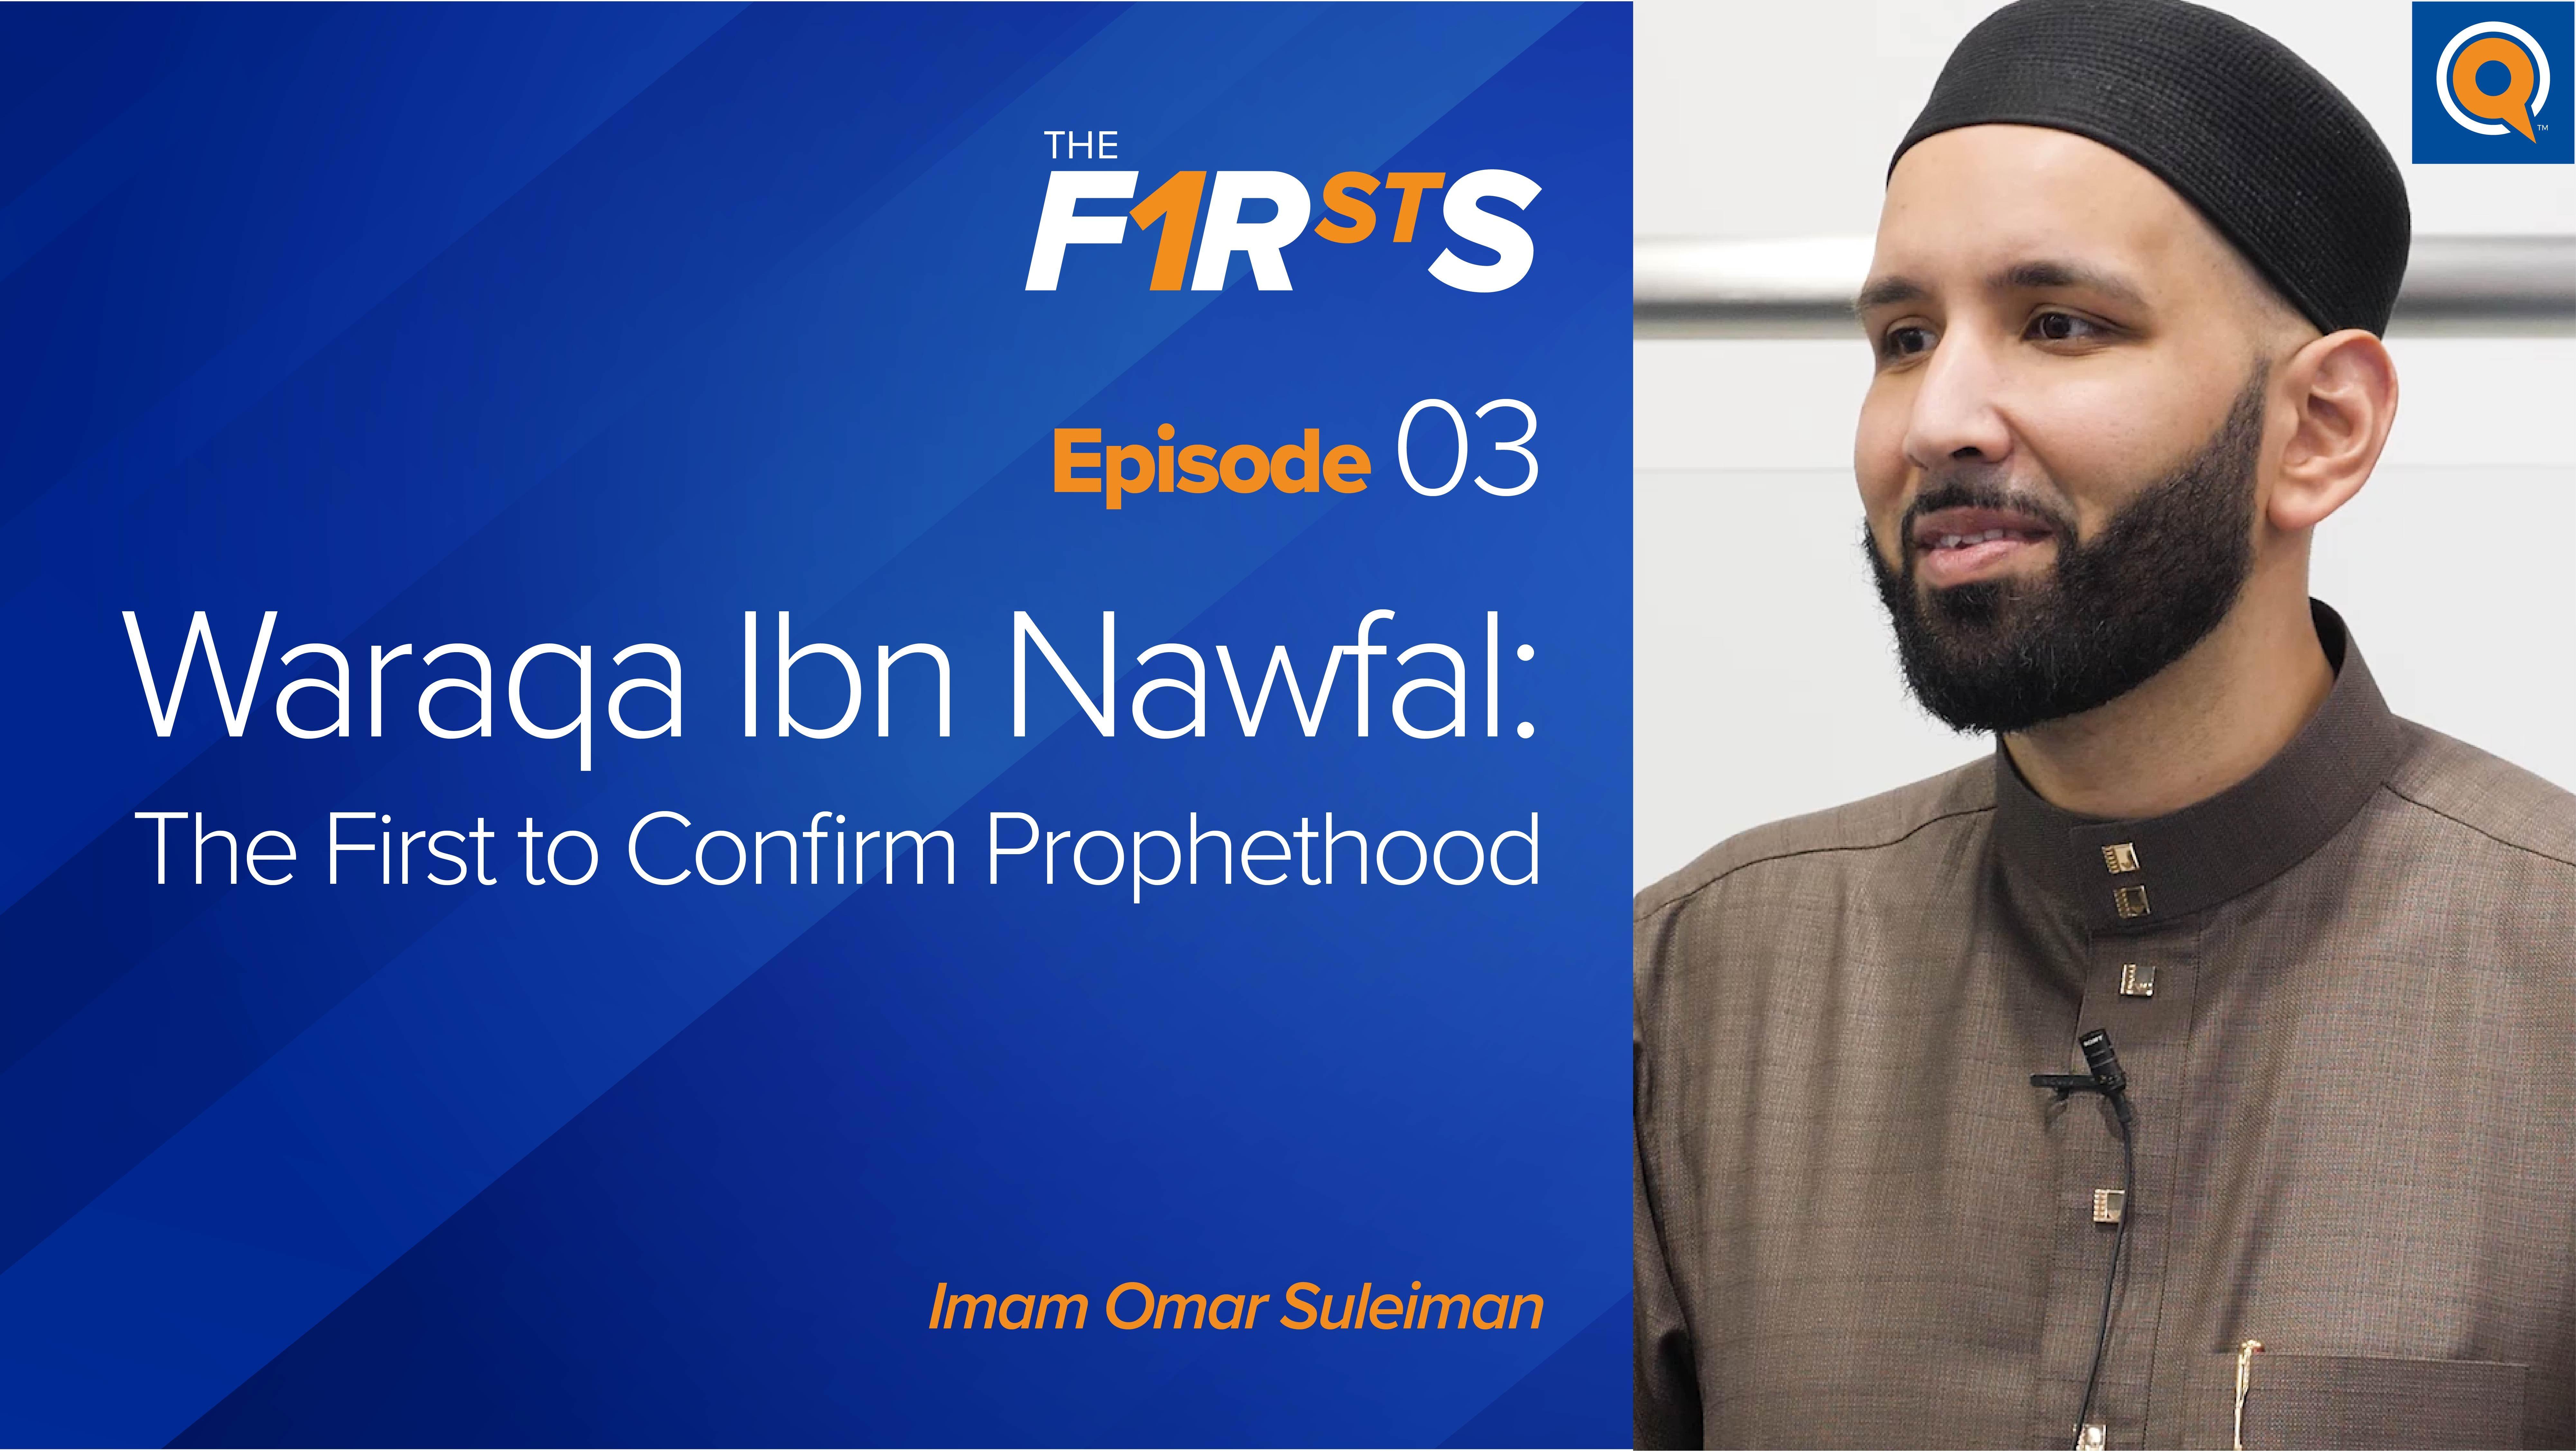 Waraqa Ibn Nawfal: The First to Confirm Prophethood